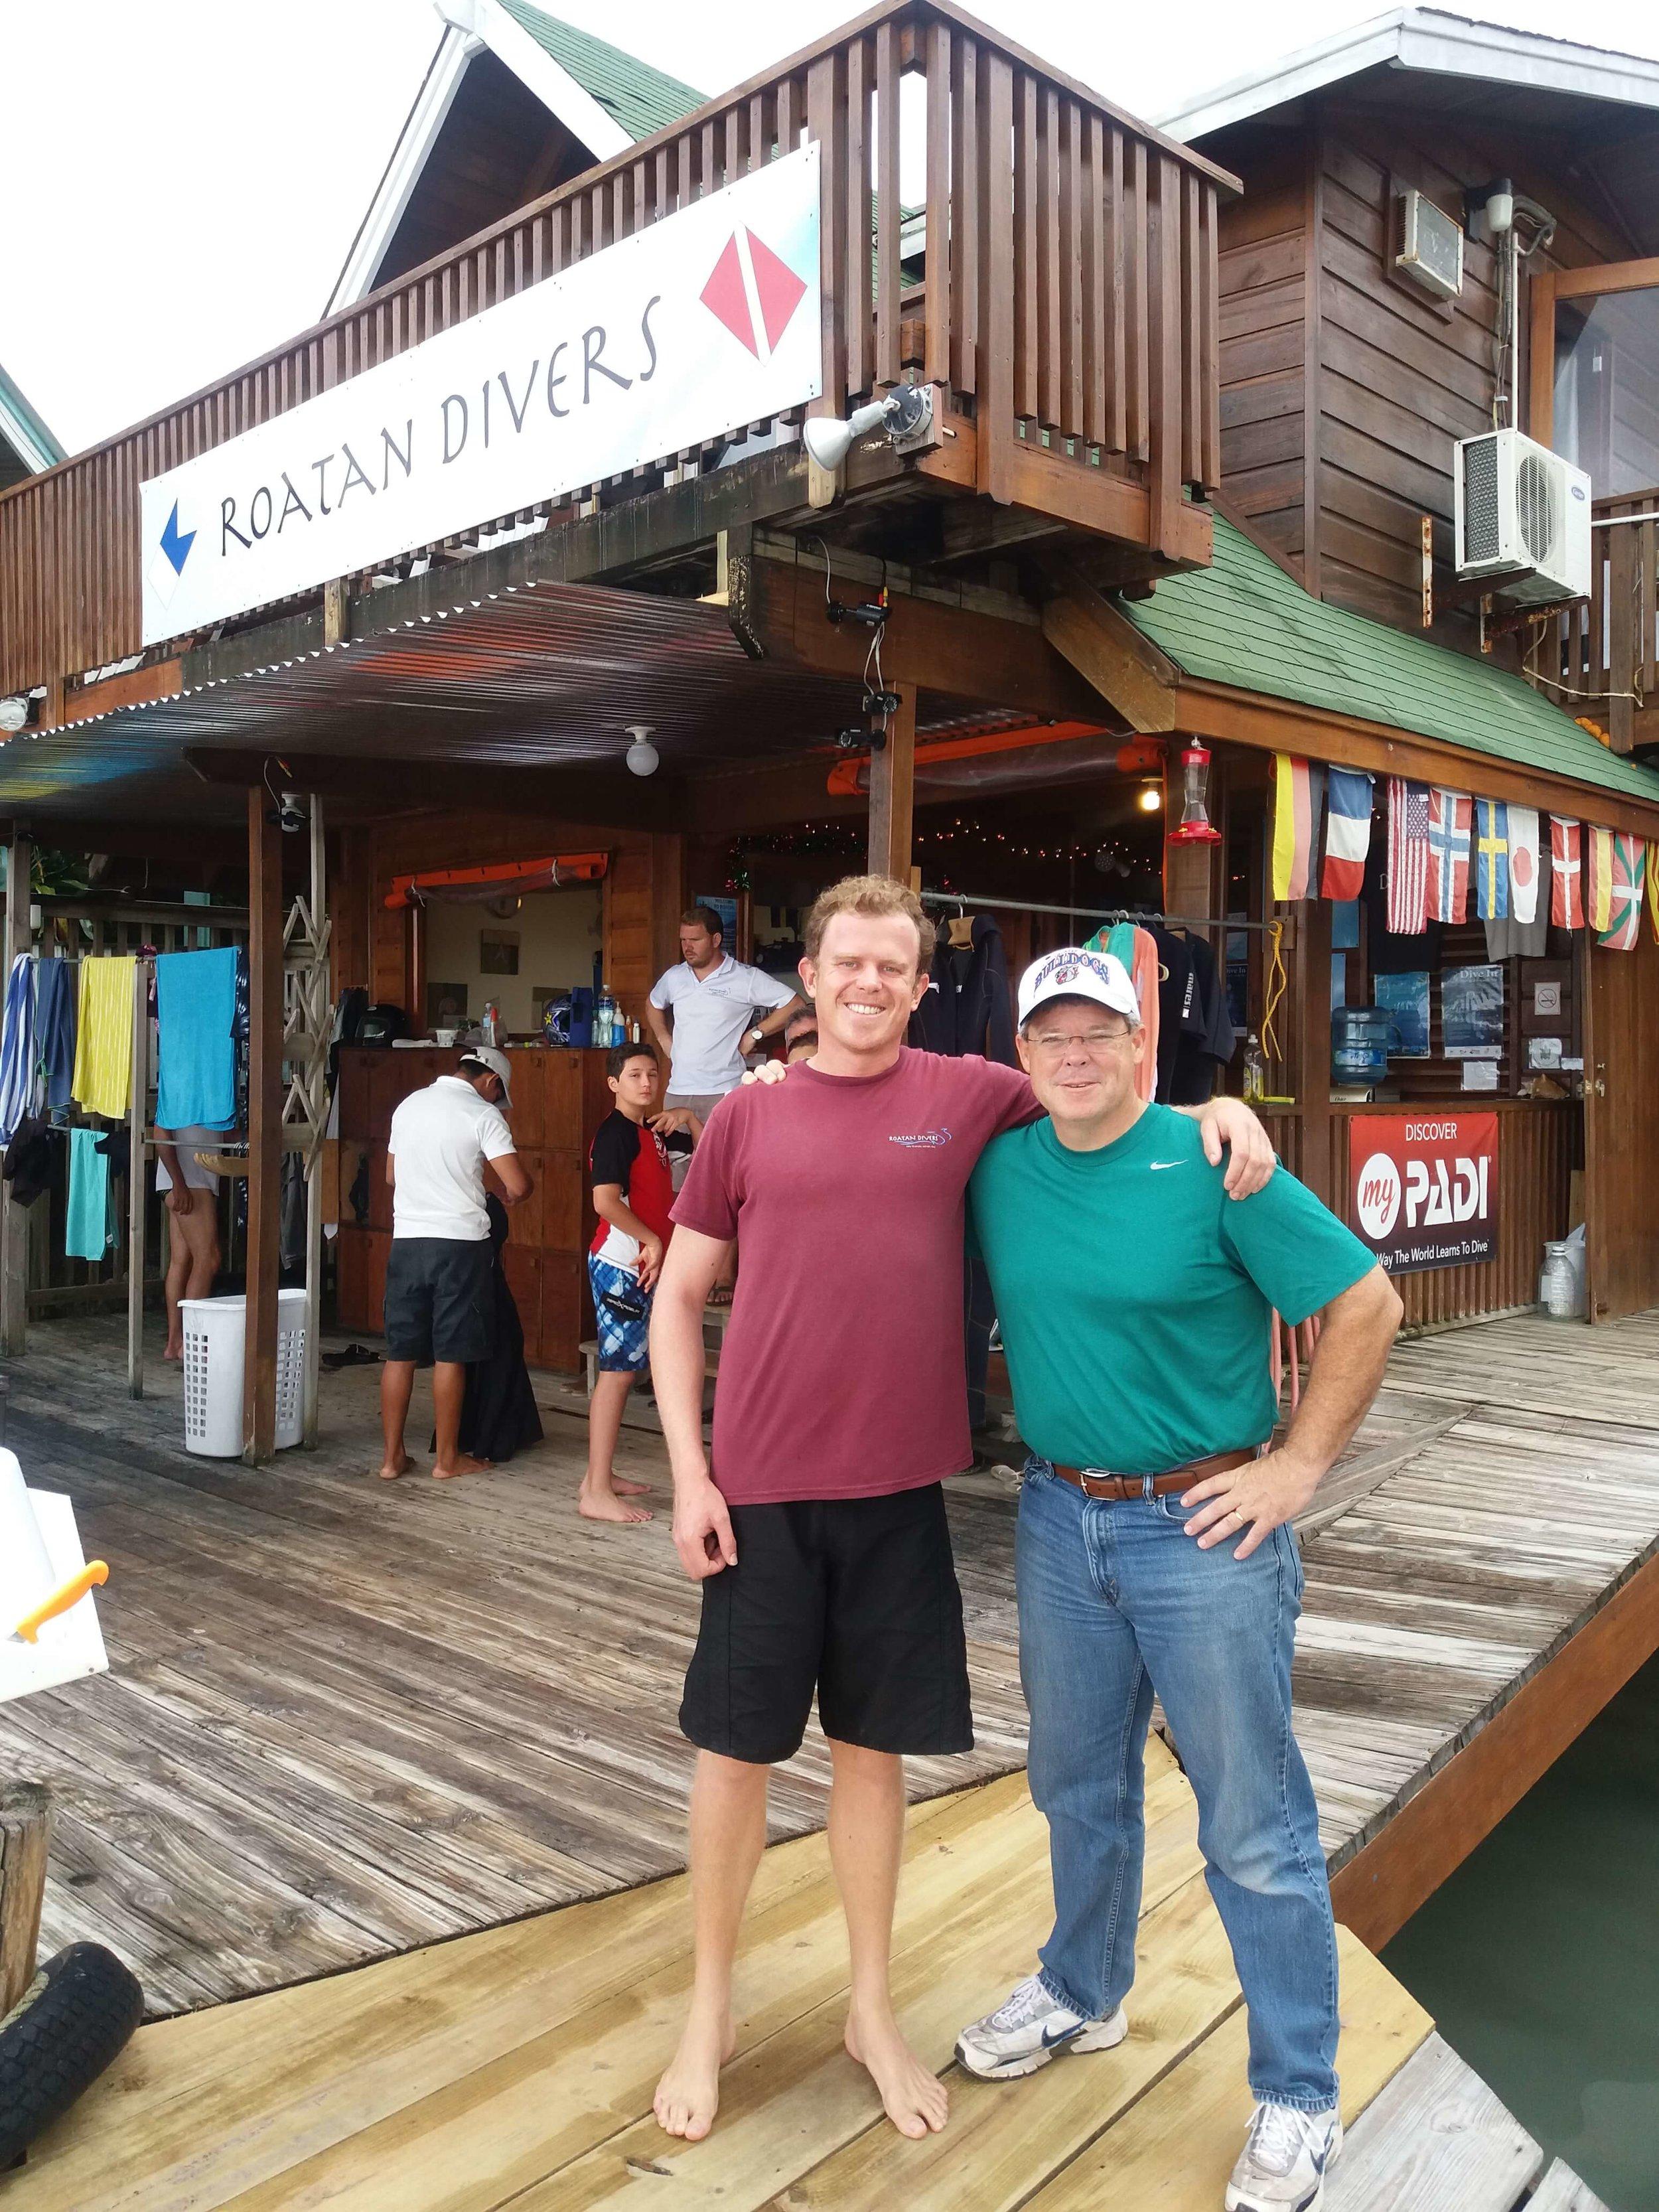 PADI Advanced Open Water Diver course Roatan Divers